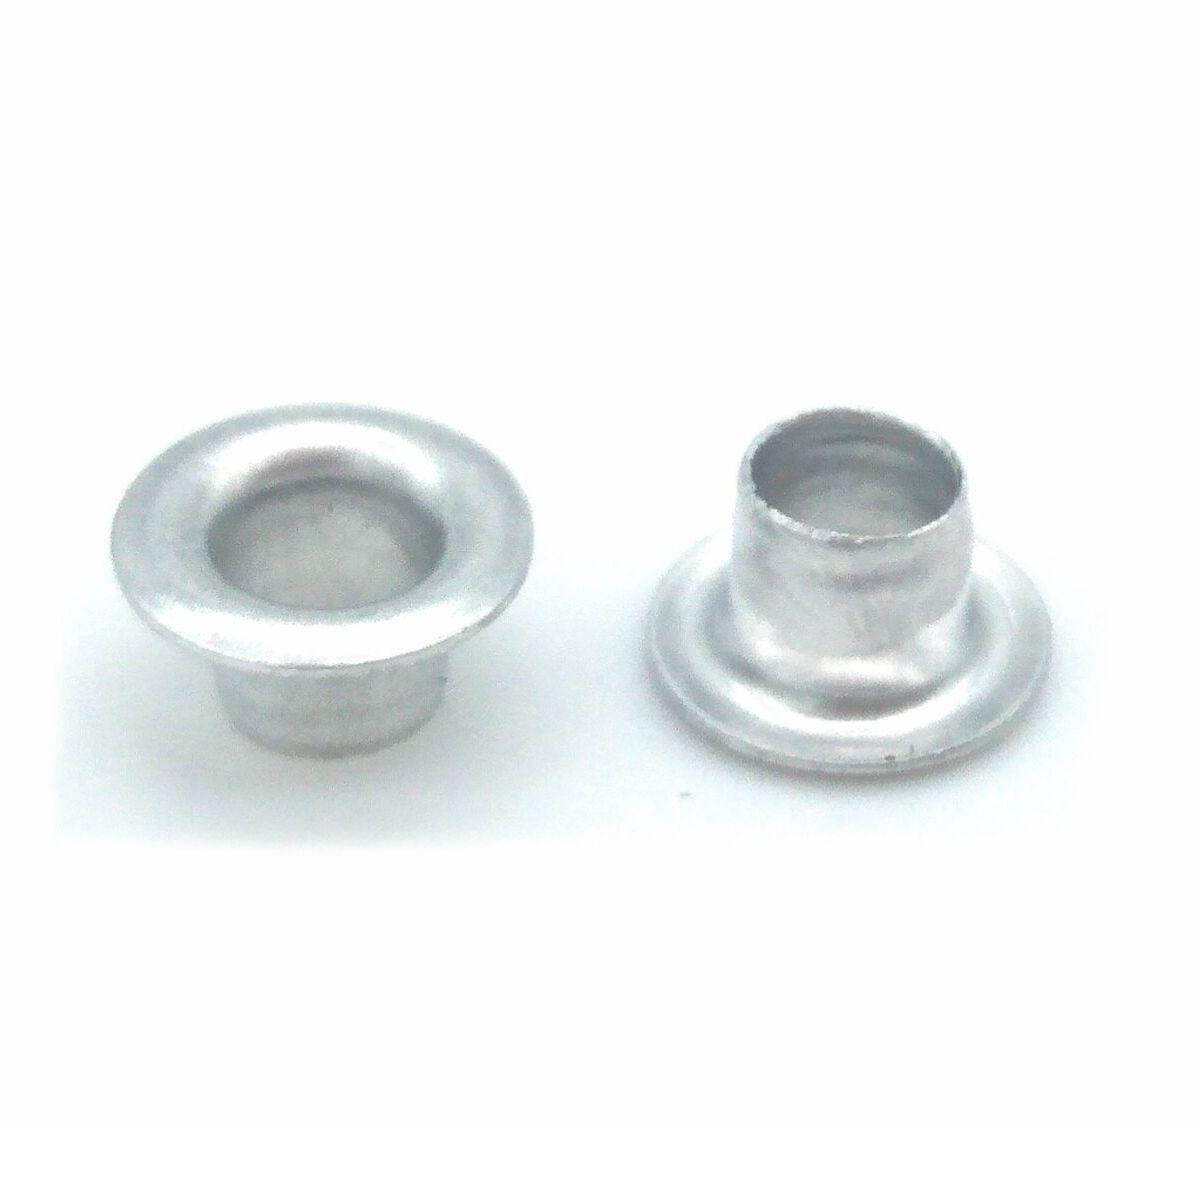 Ilhós Alumínio Prata Nº 54 8mm de diâmetro externo